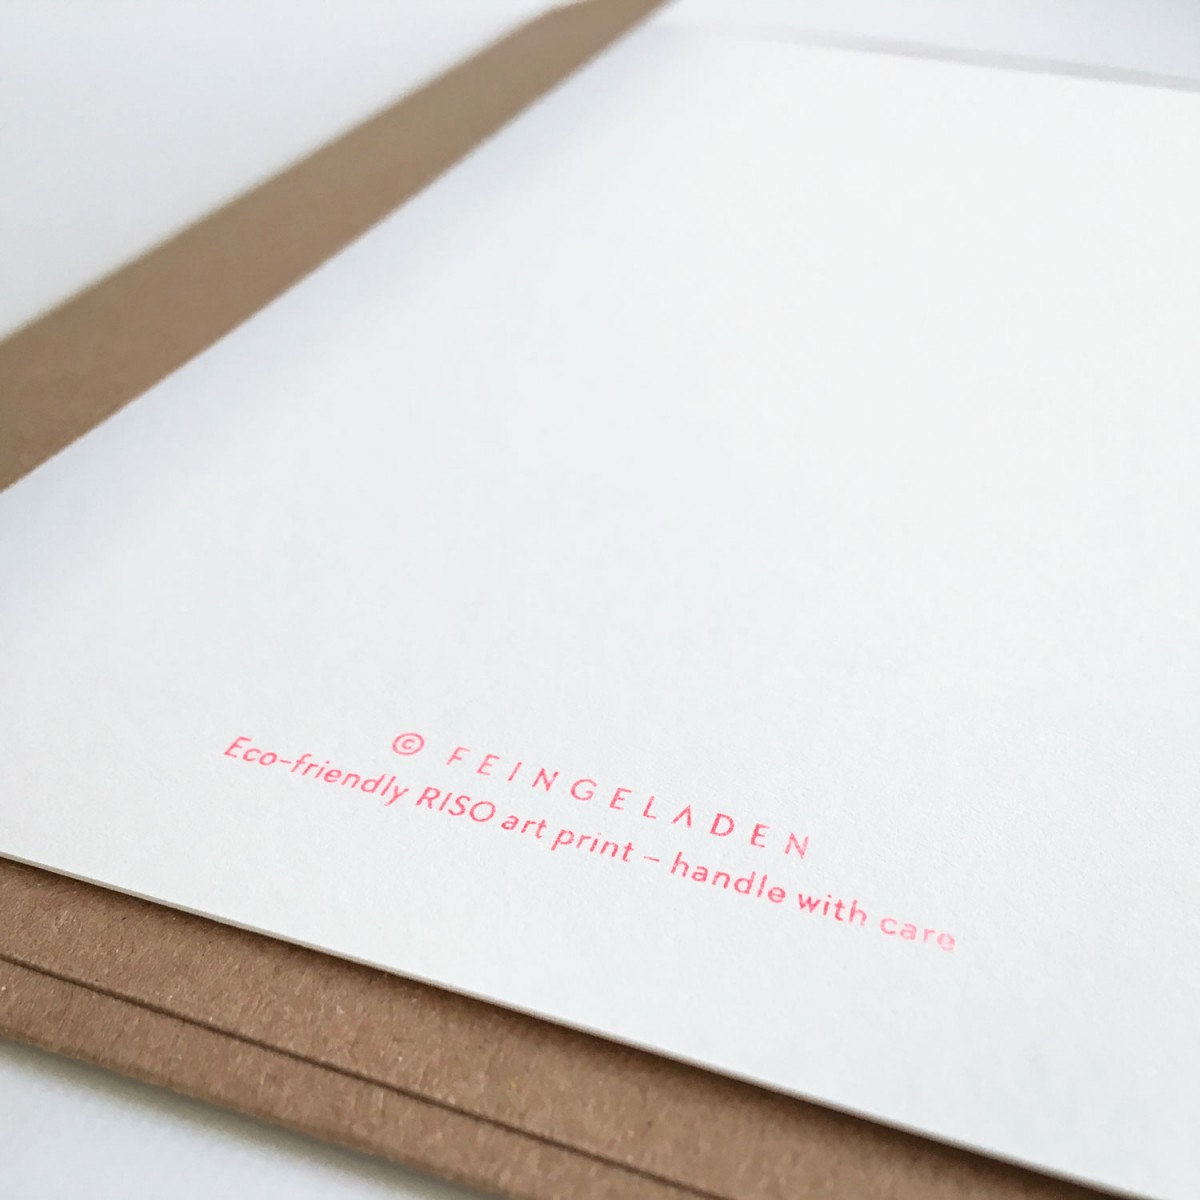 Feingeladen // LOVELY BEASTS // Piggy »Sau viel Glück!« (TLFR) Kunstdruck, A5